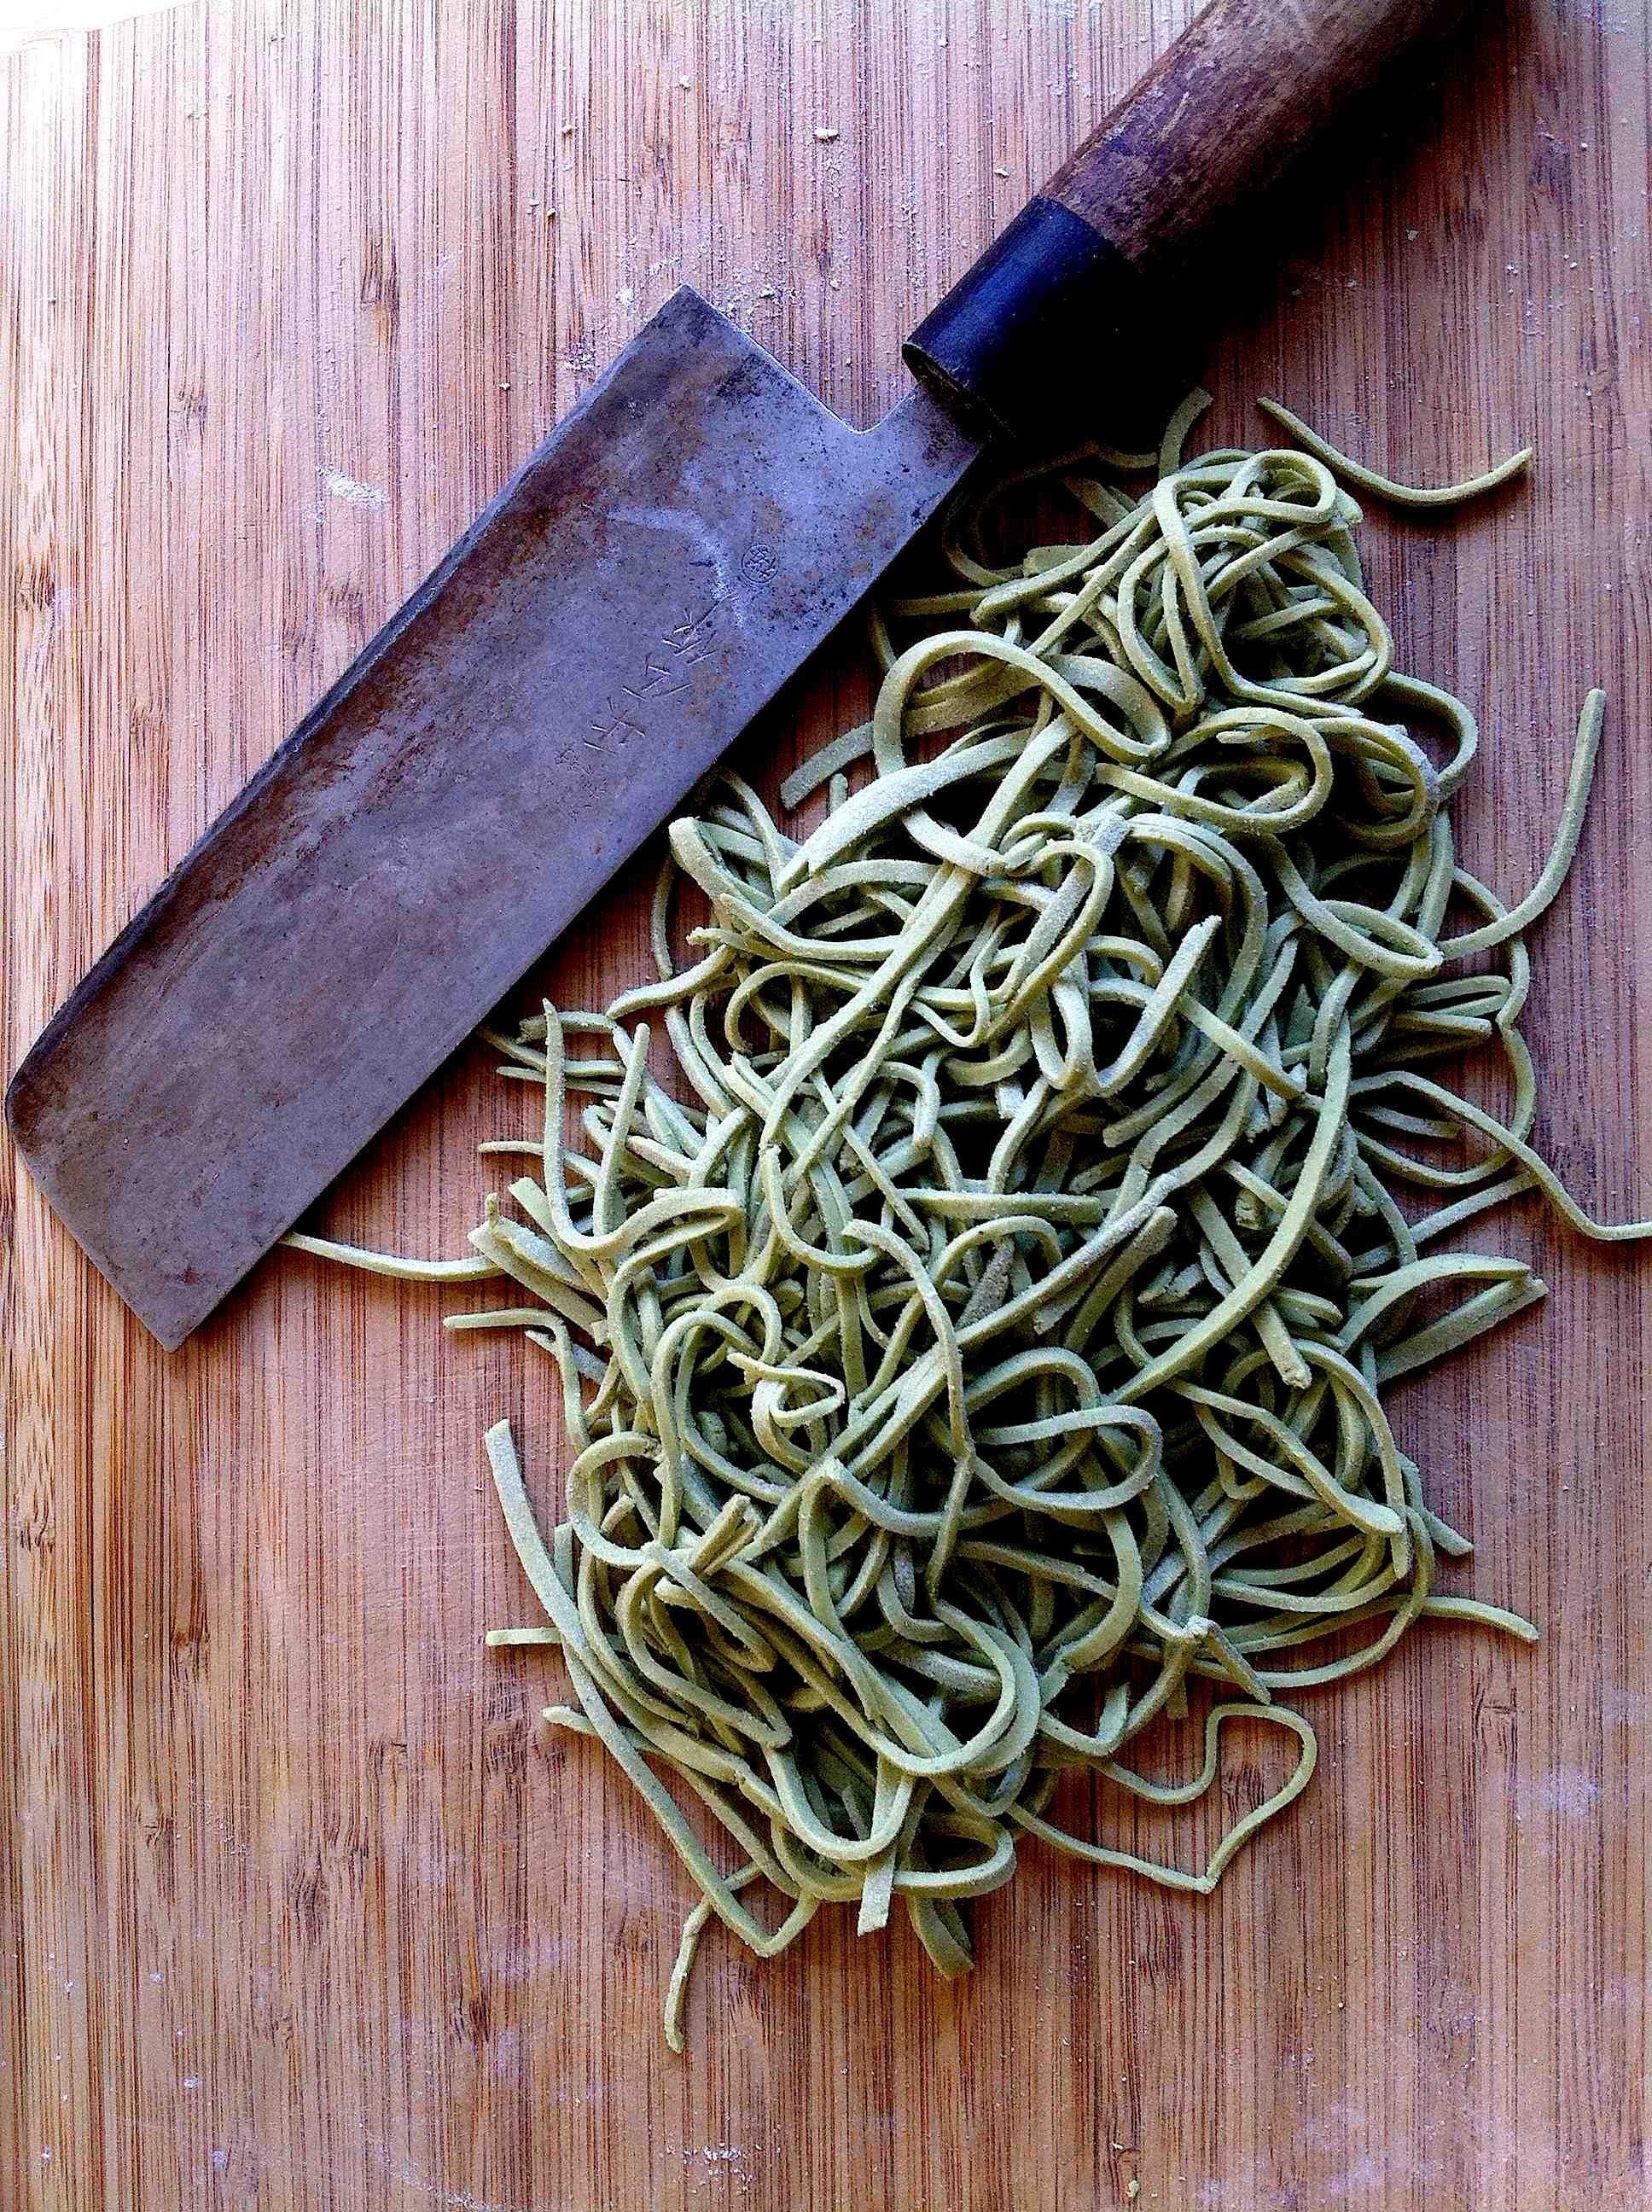 Green Tea Buckwheat Noodles- made by me! #greentea #buckwheat #japanese #noodles